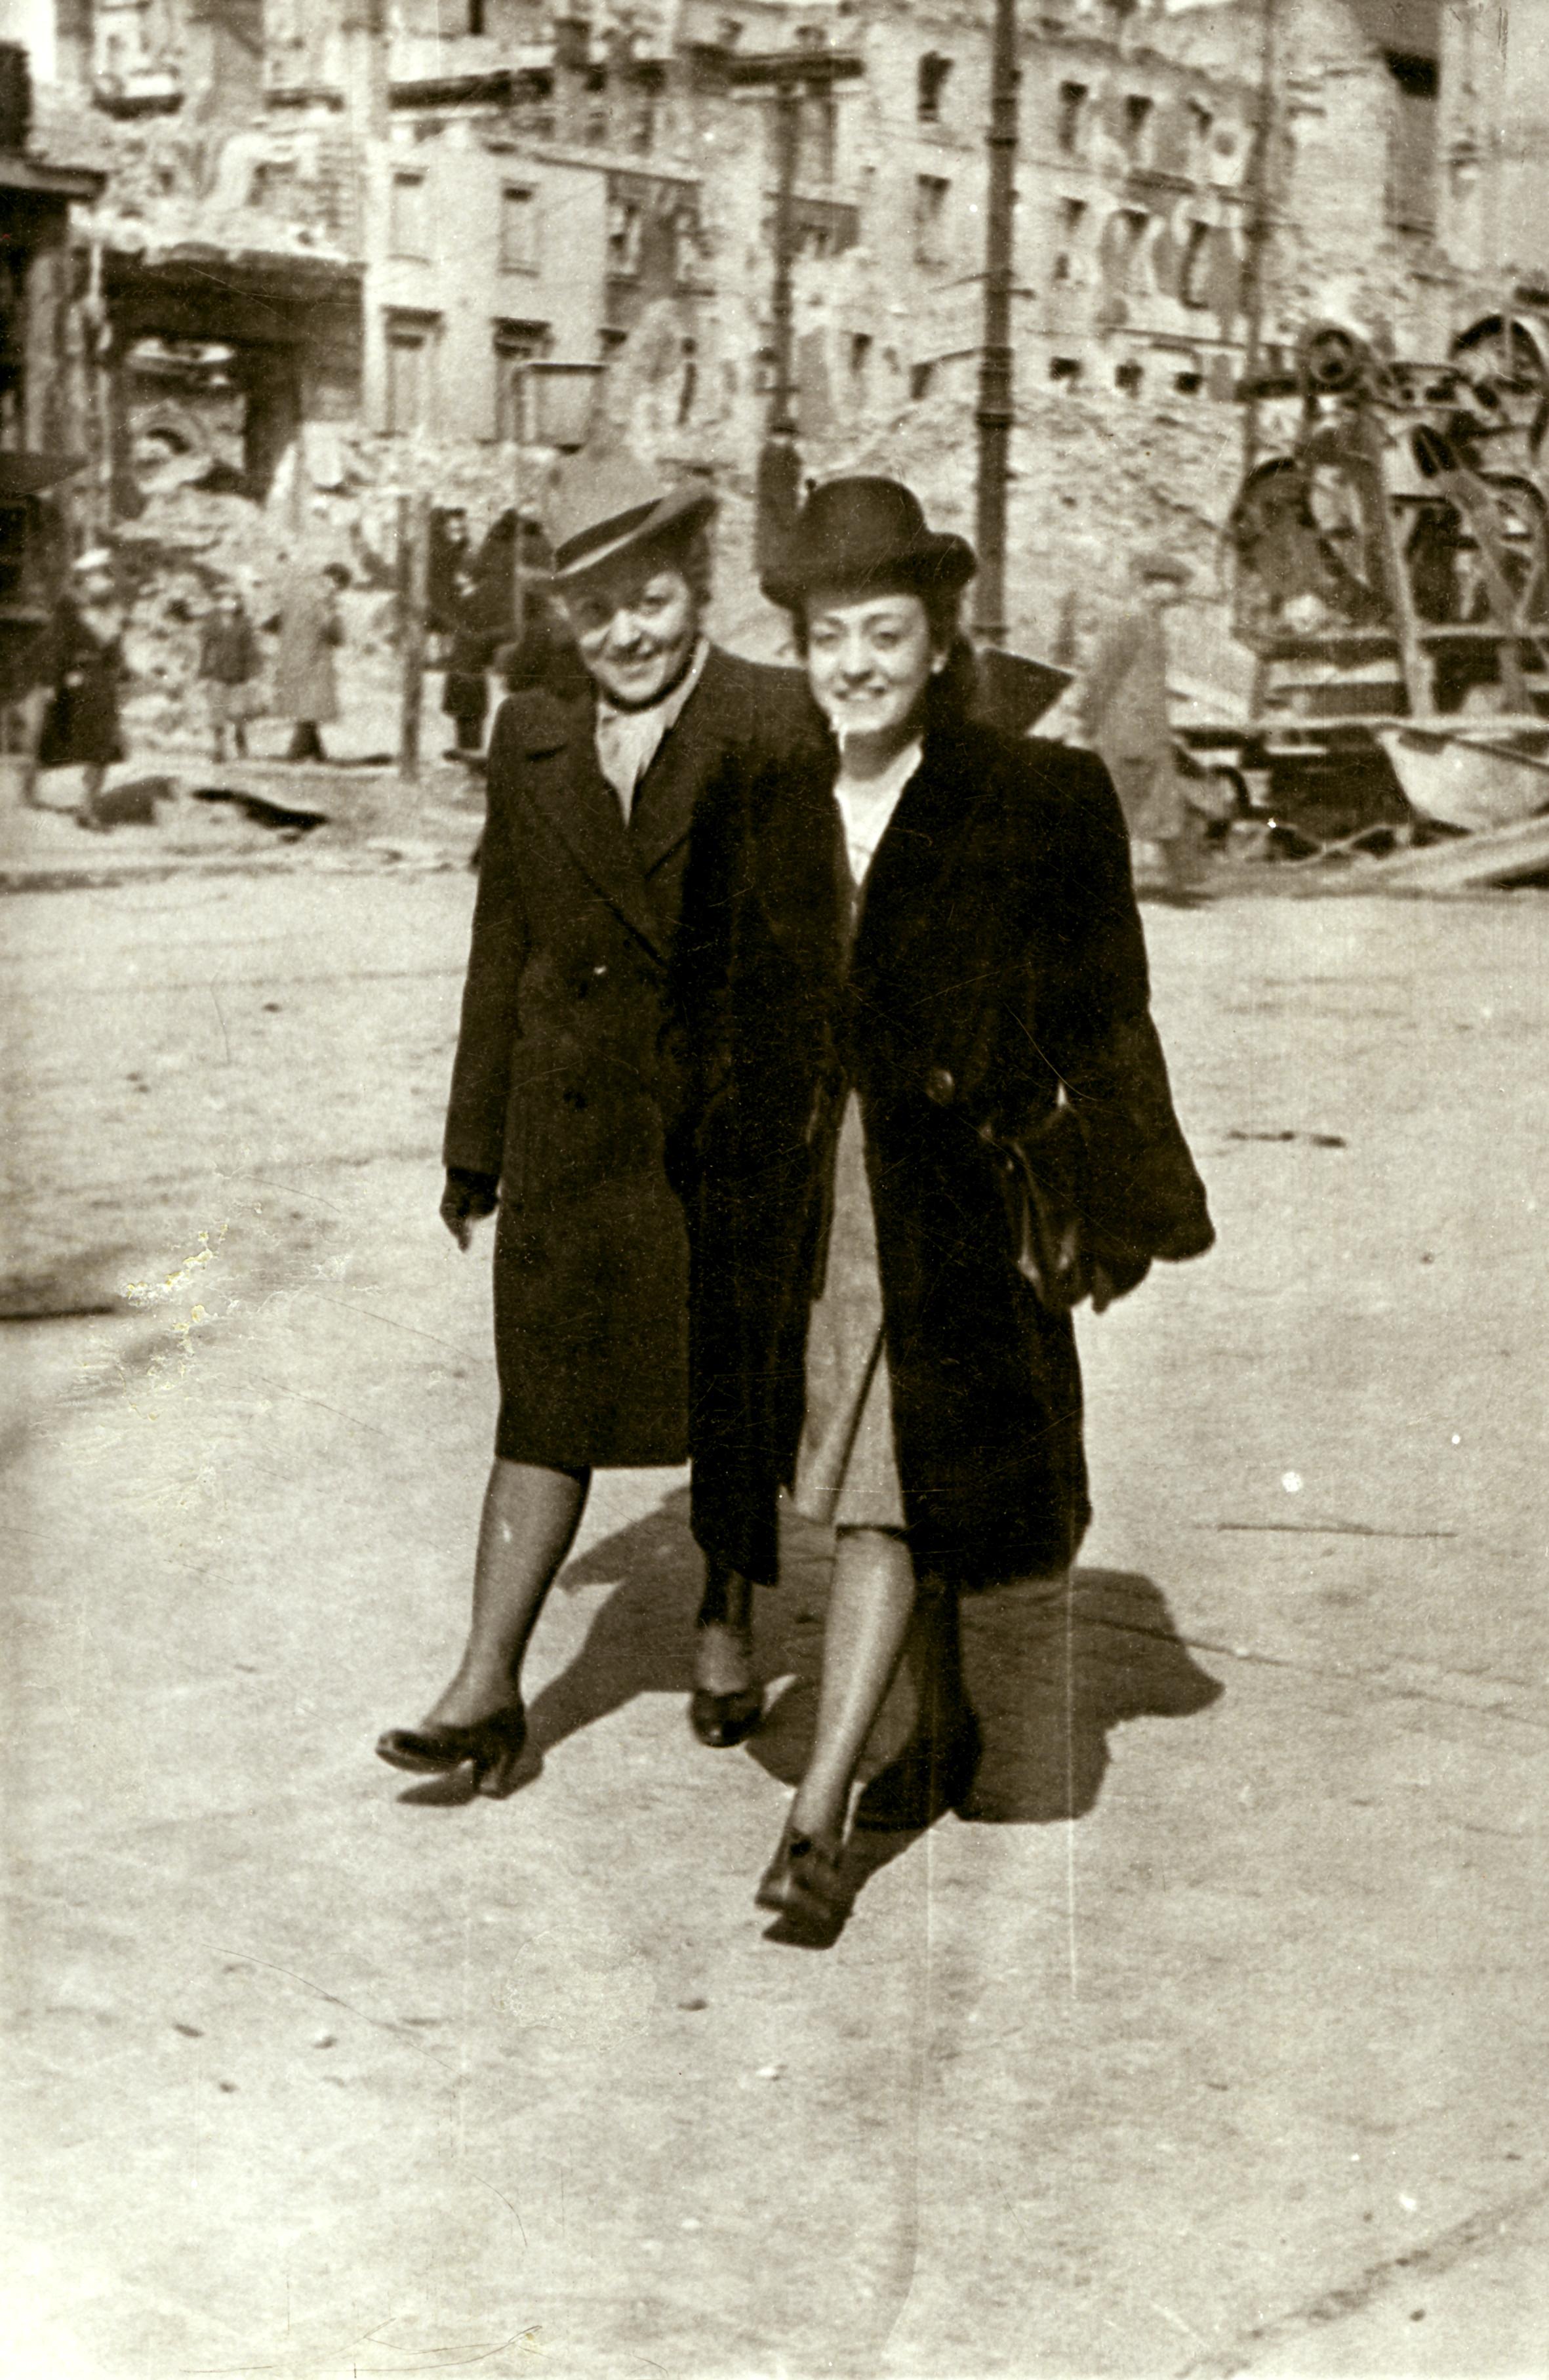 Apolonia Starzec with her sister Irena Kirszenbaum